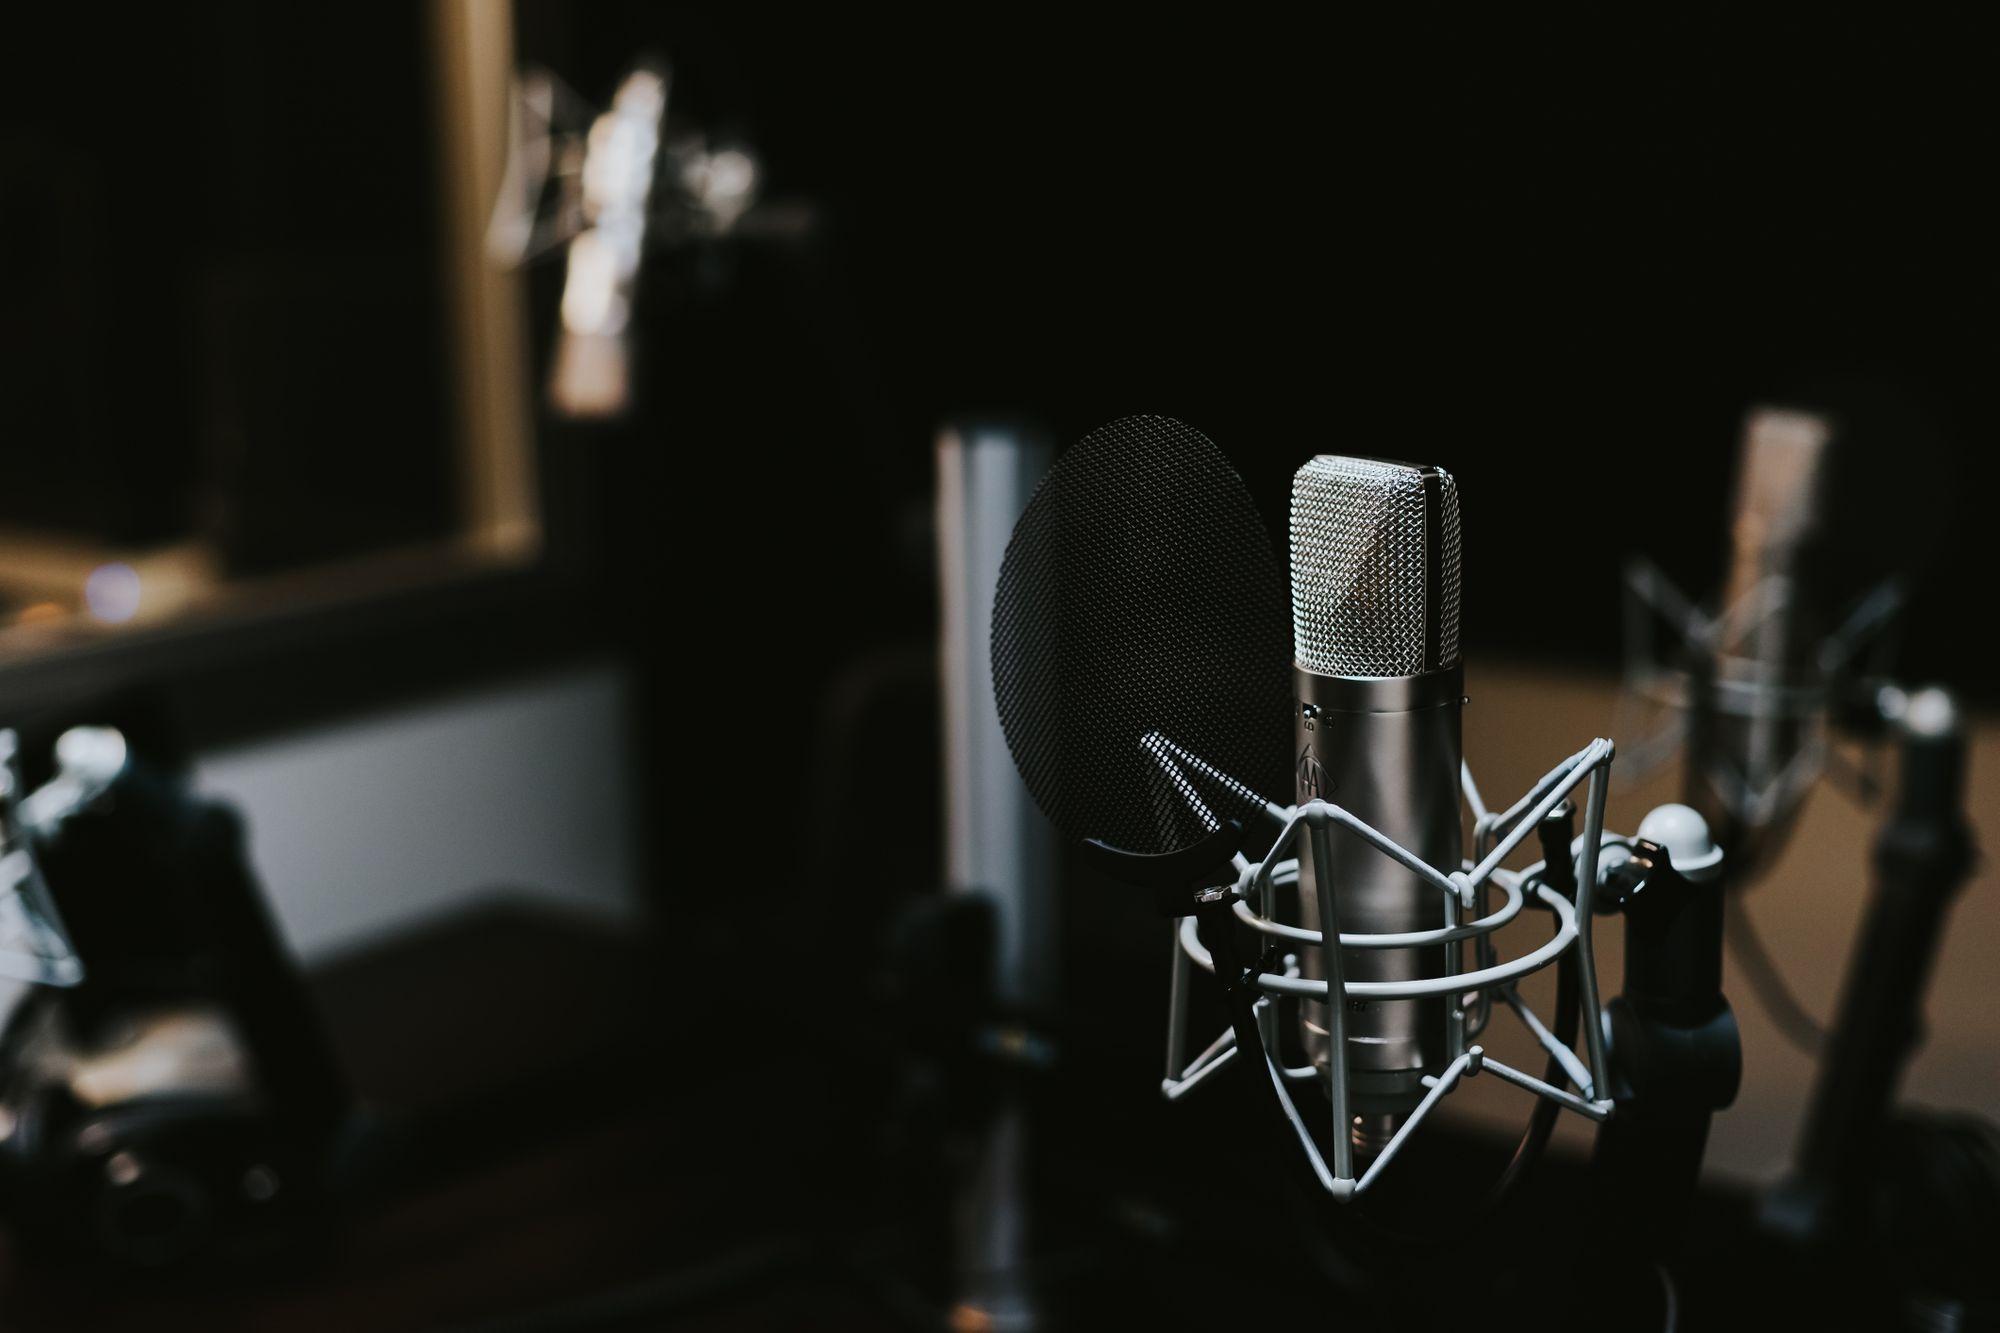 [190] Sam's Podcast v0.8